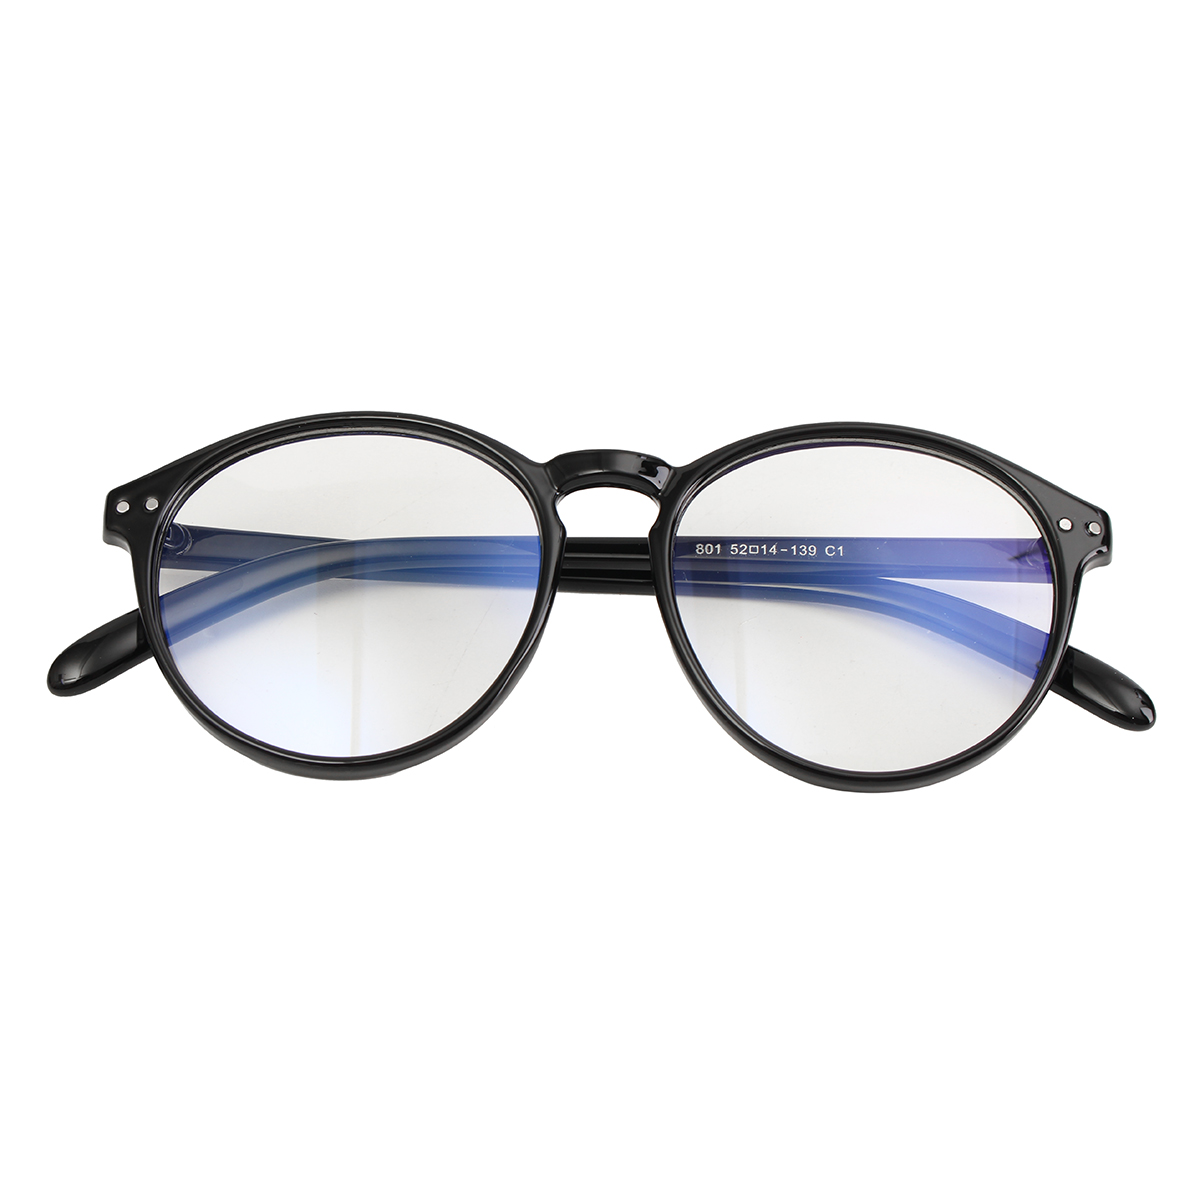 Vintage Round Eyeglass Frame Glasses Retro Spectacles Clear Lens ...